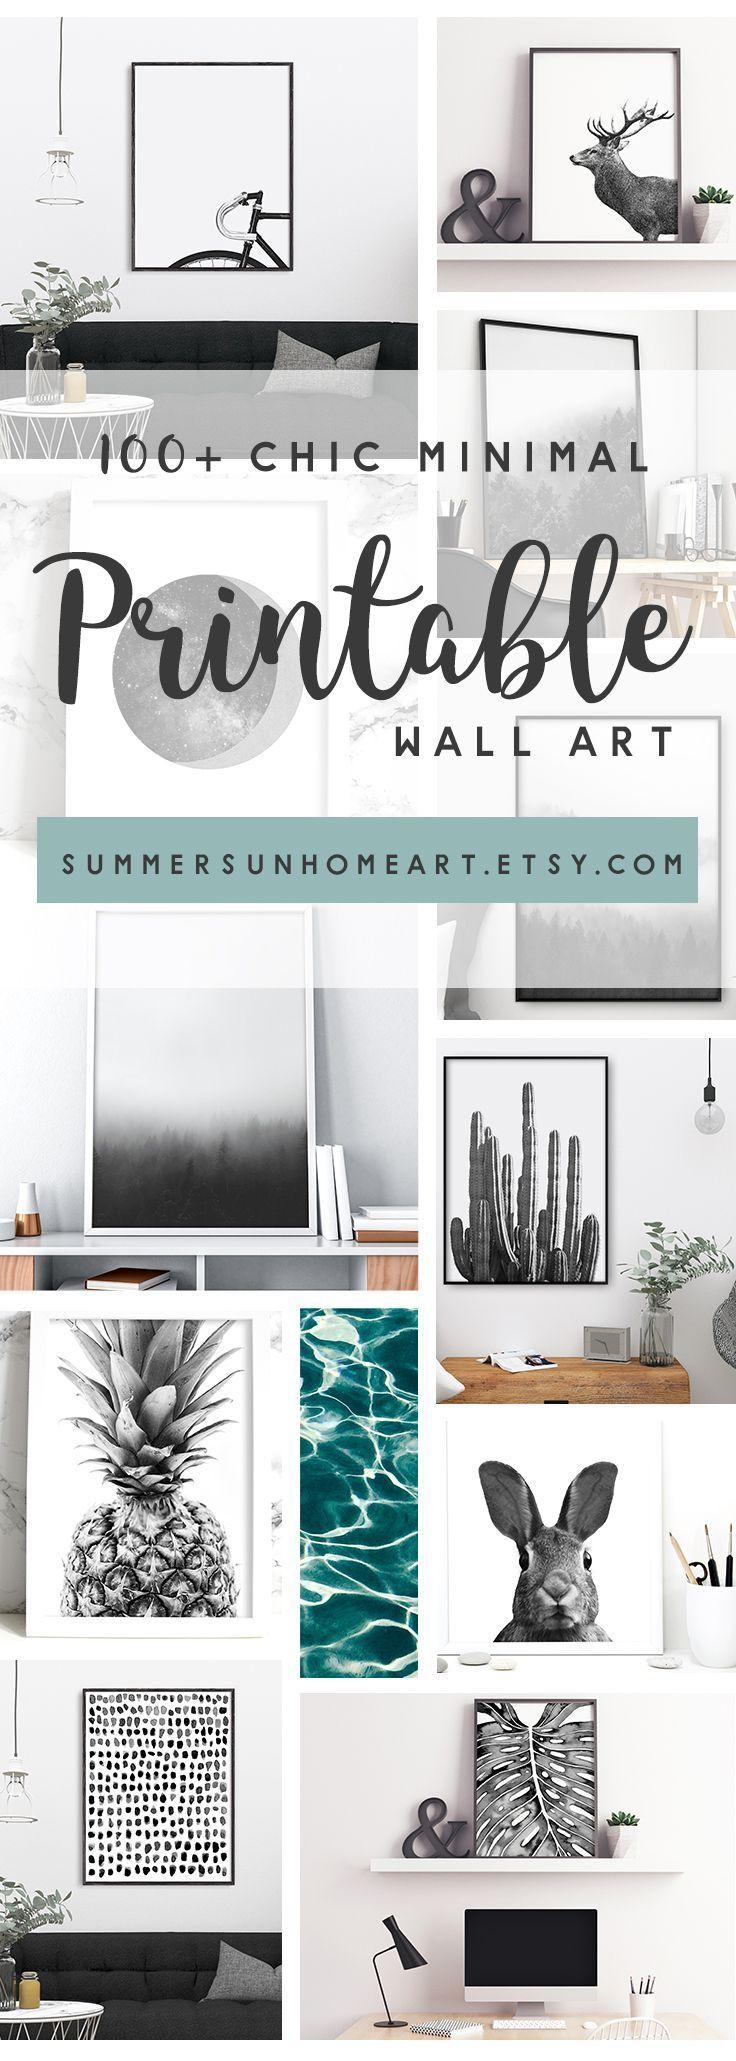 Mitte jahrhundert badezimmer dekor amazing minimalist art prints from summersunhomeartetsycom  home